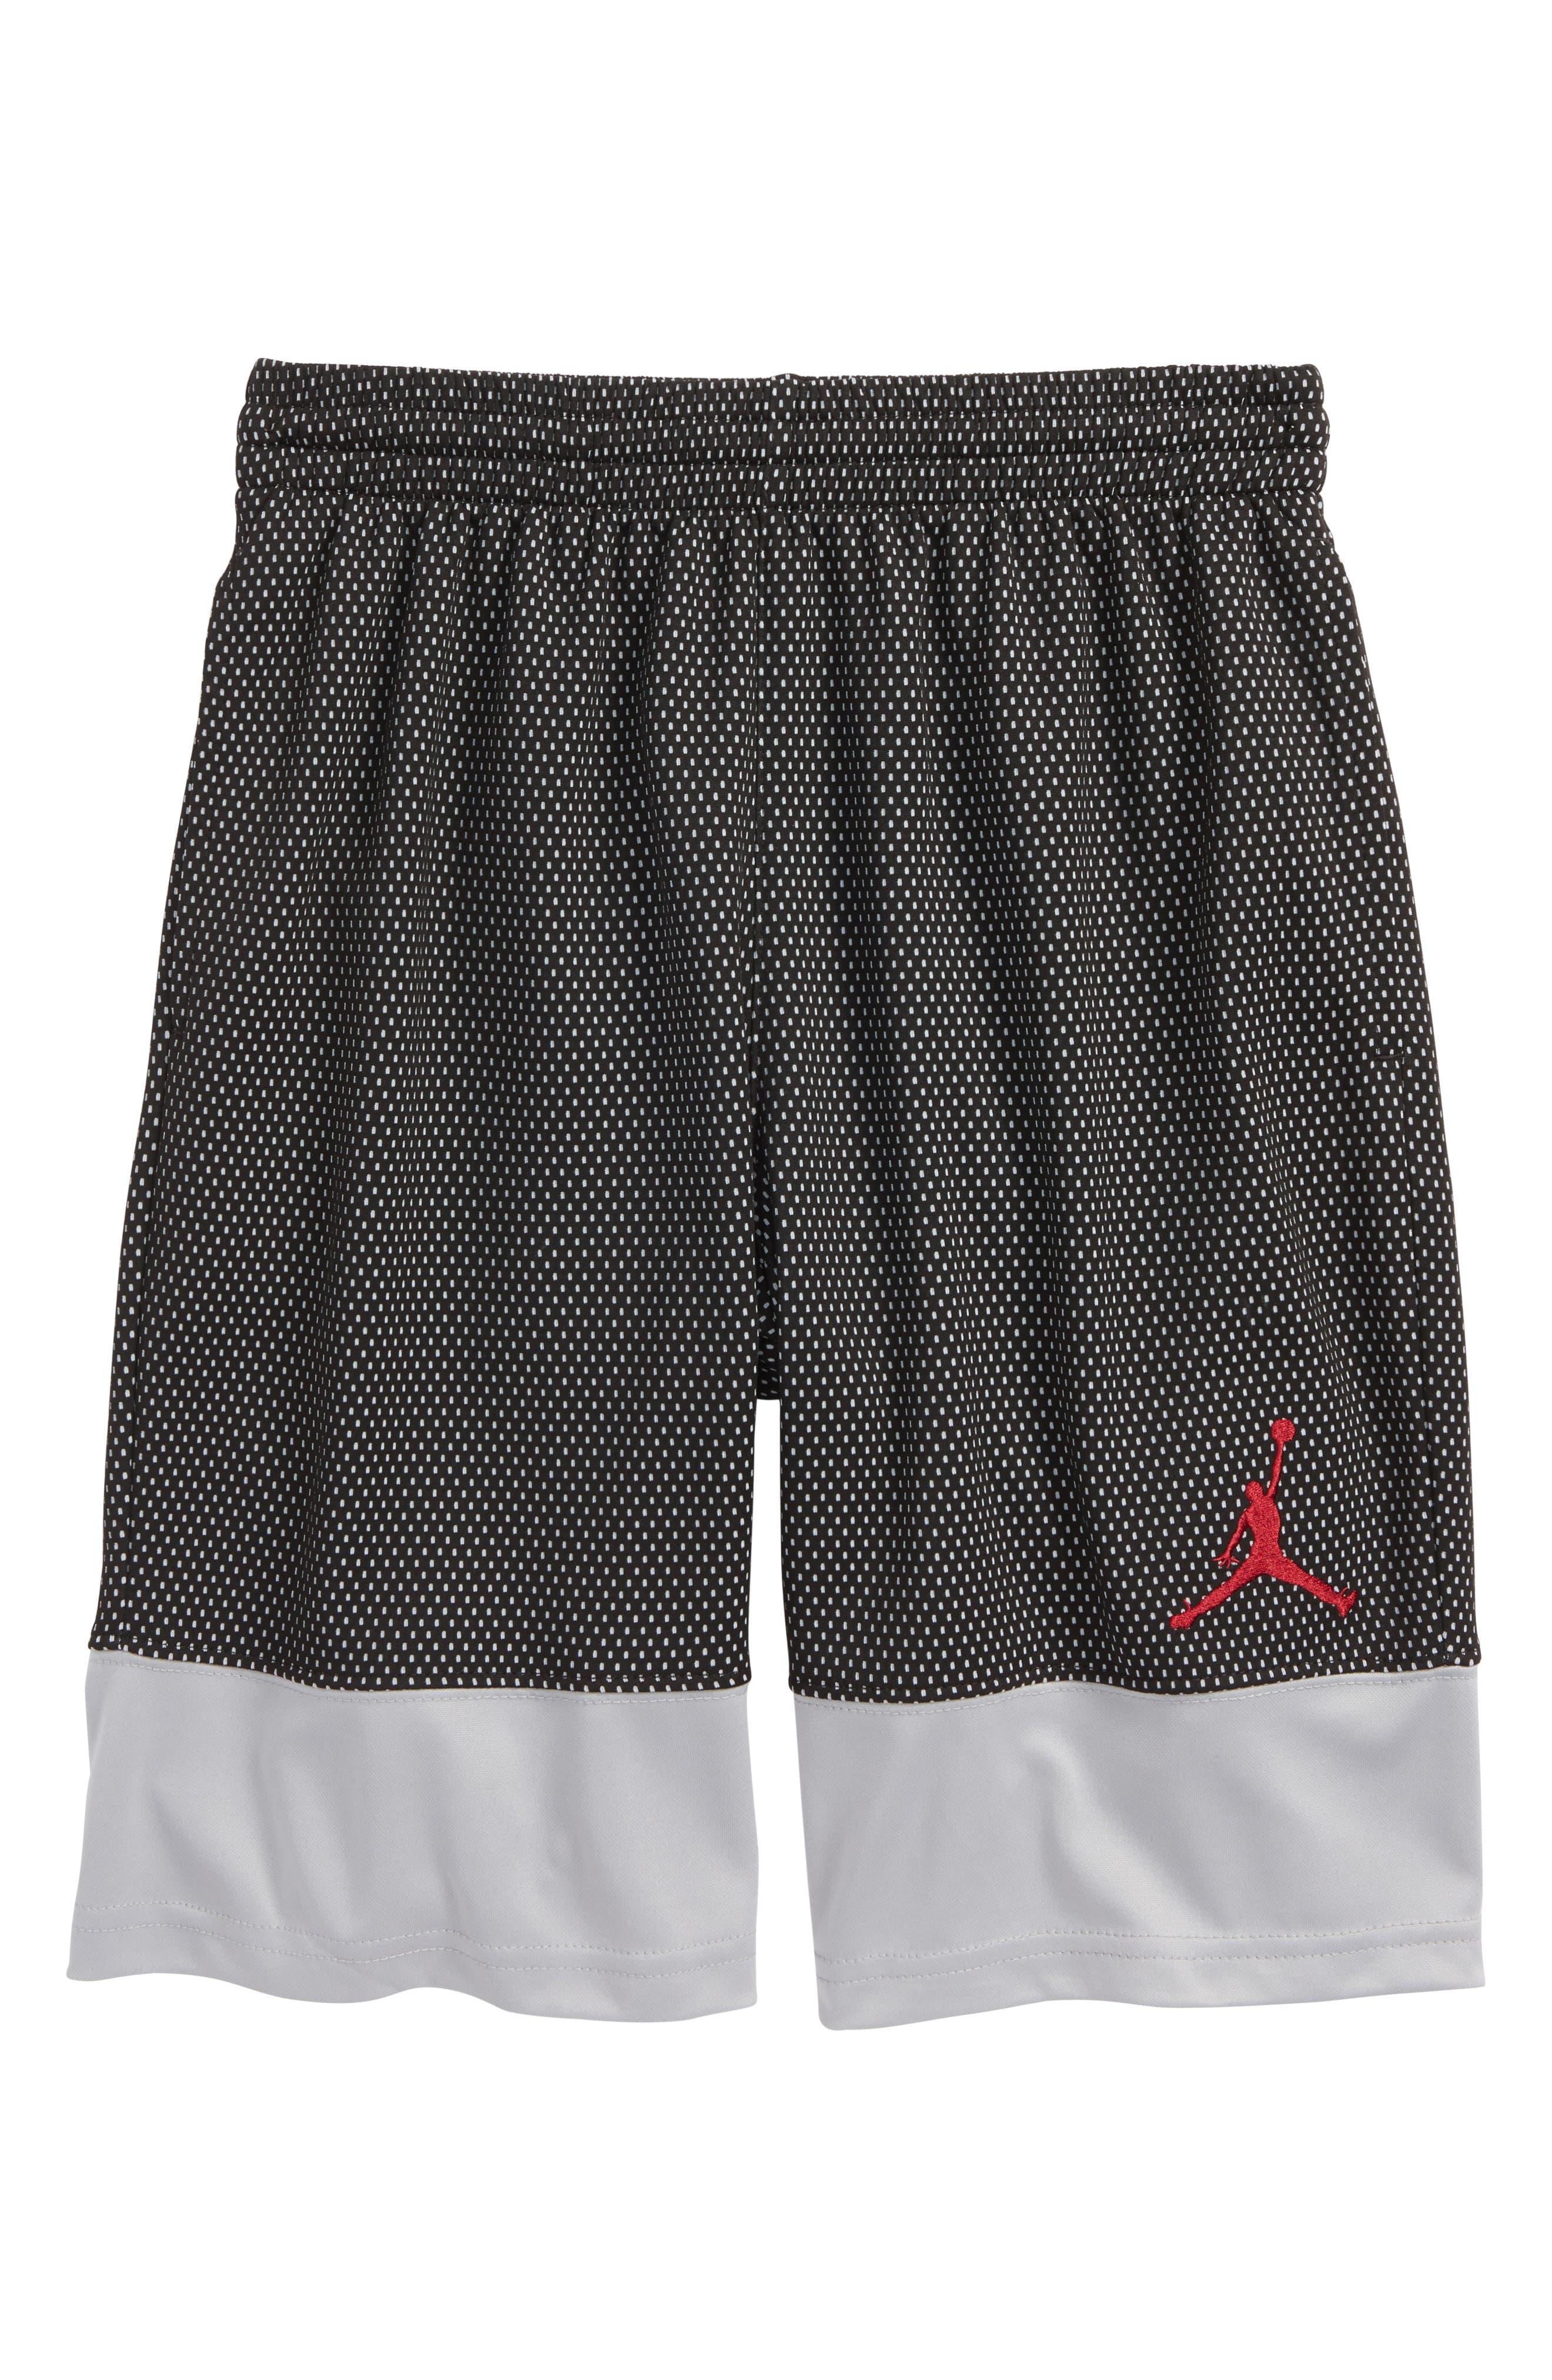 Alternate Image 1 Selected - Jordan AJ 90s D2 Mesh Shorts (Big Boys)